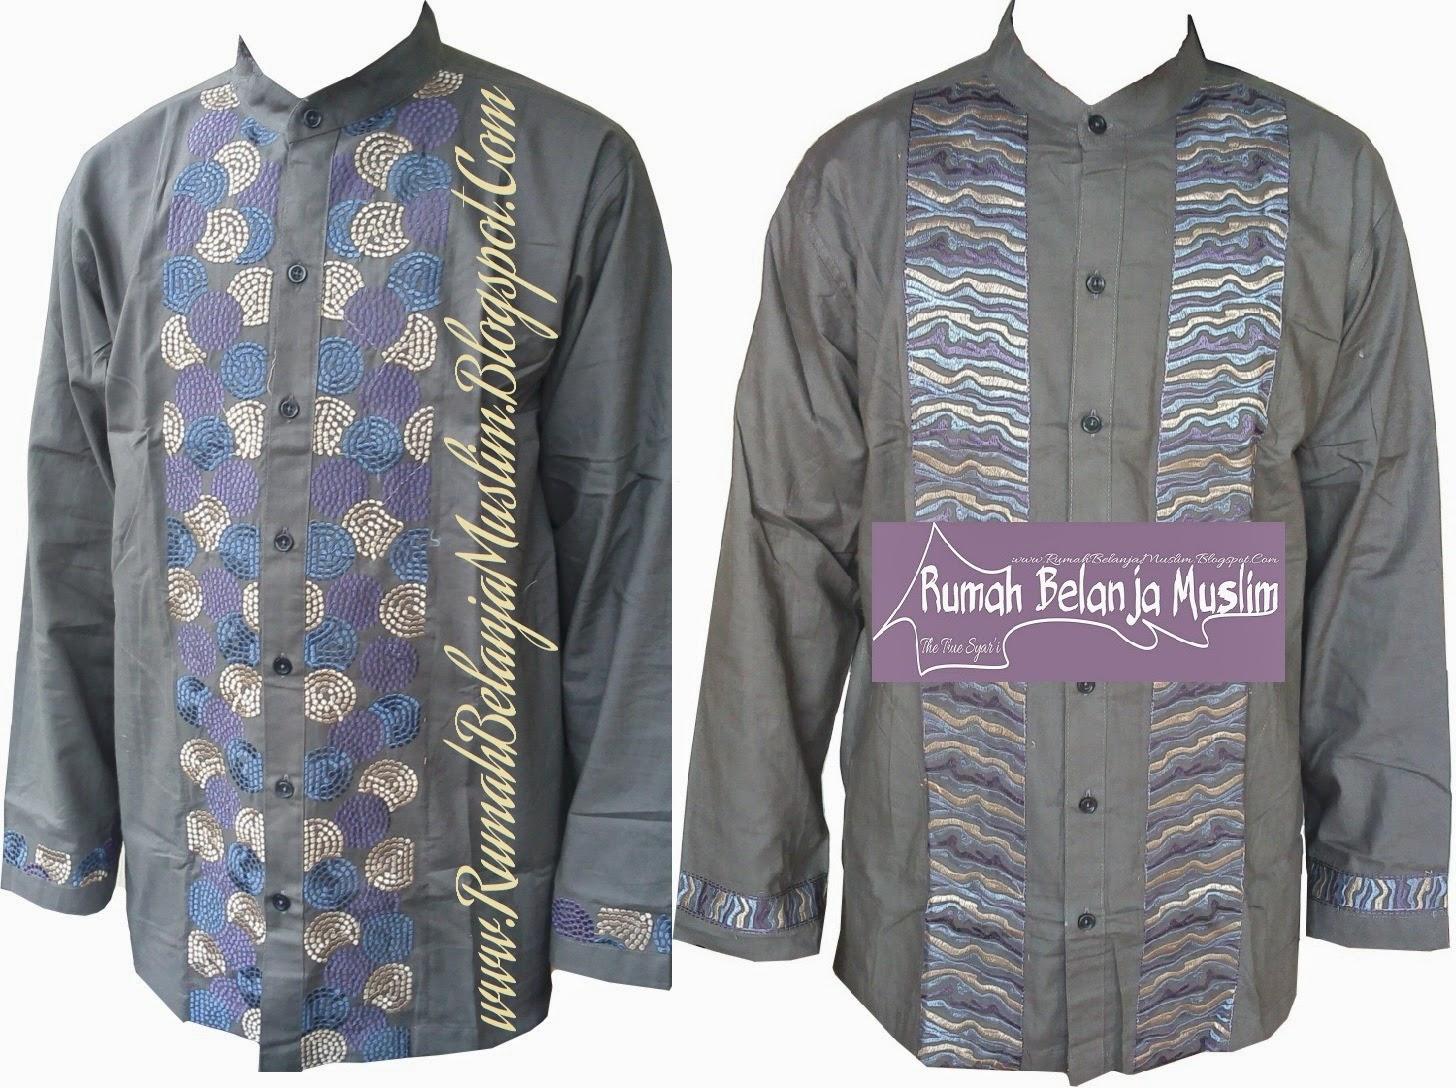 Belanja Baju Muslim Praktis Aman Dan Nyaman